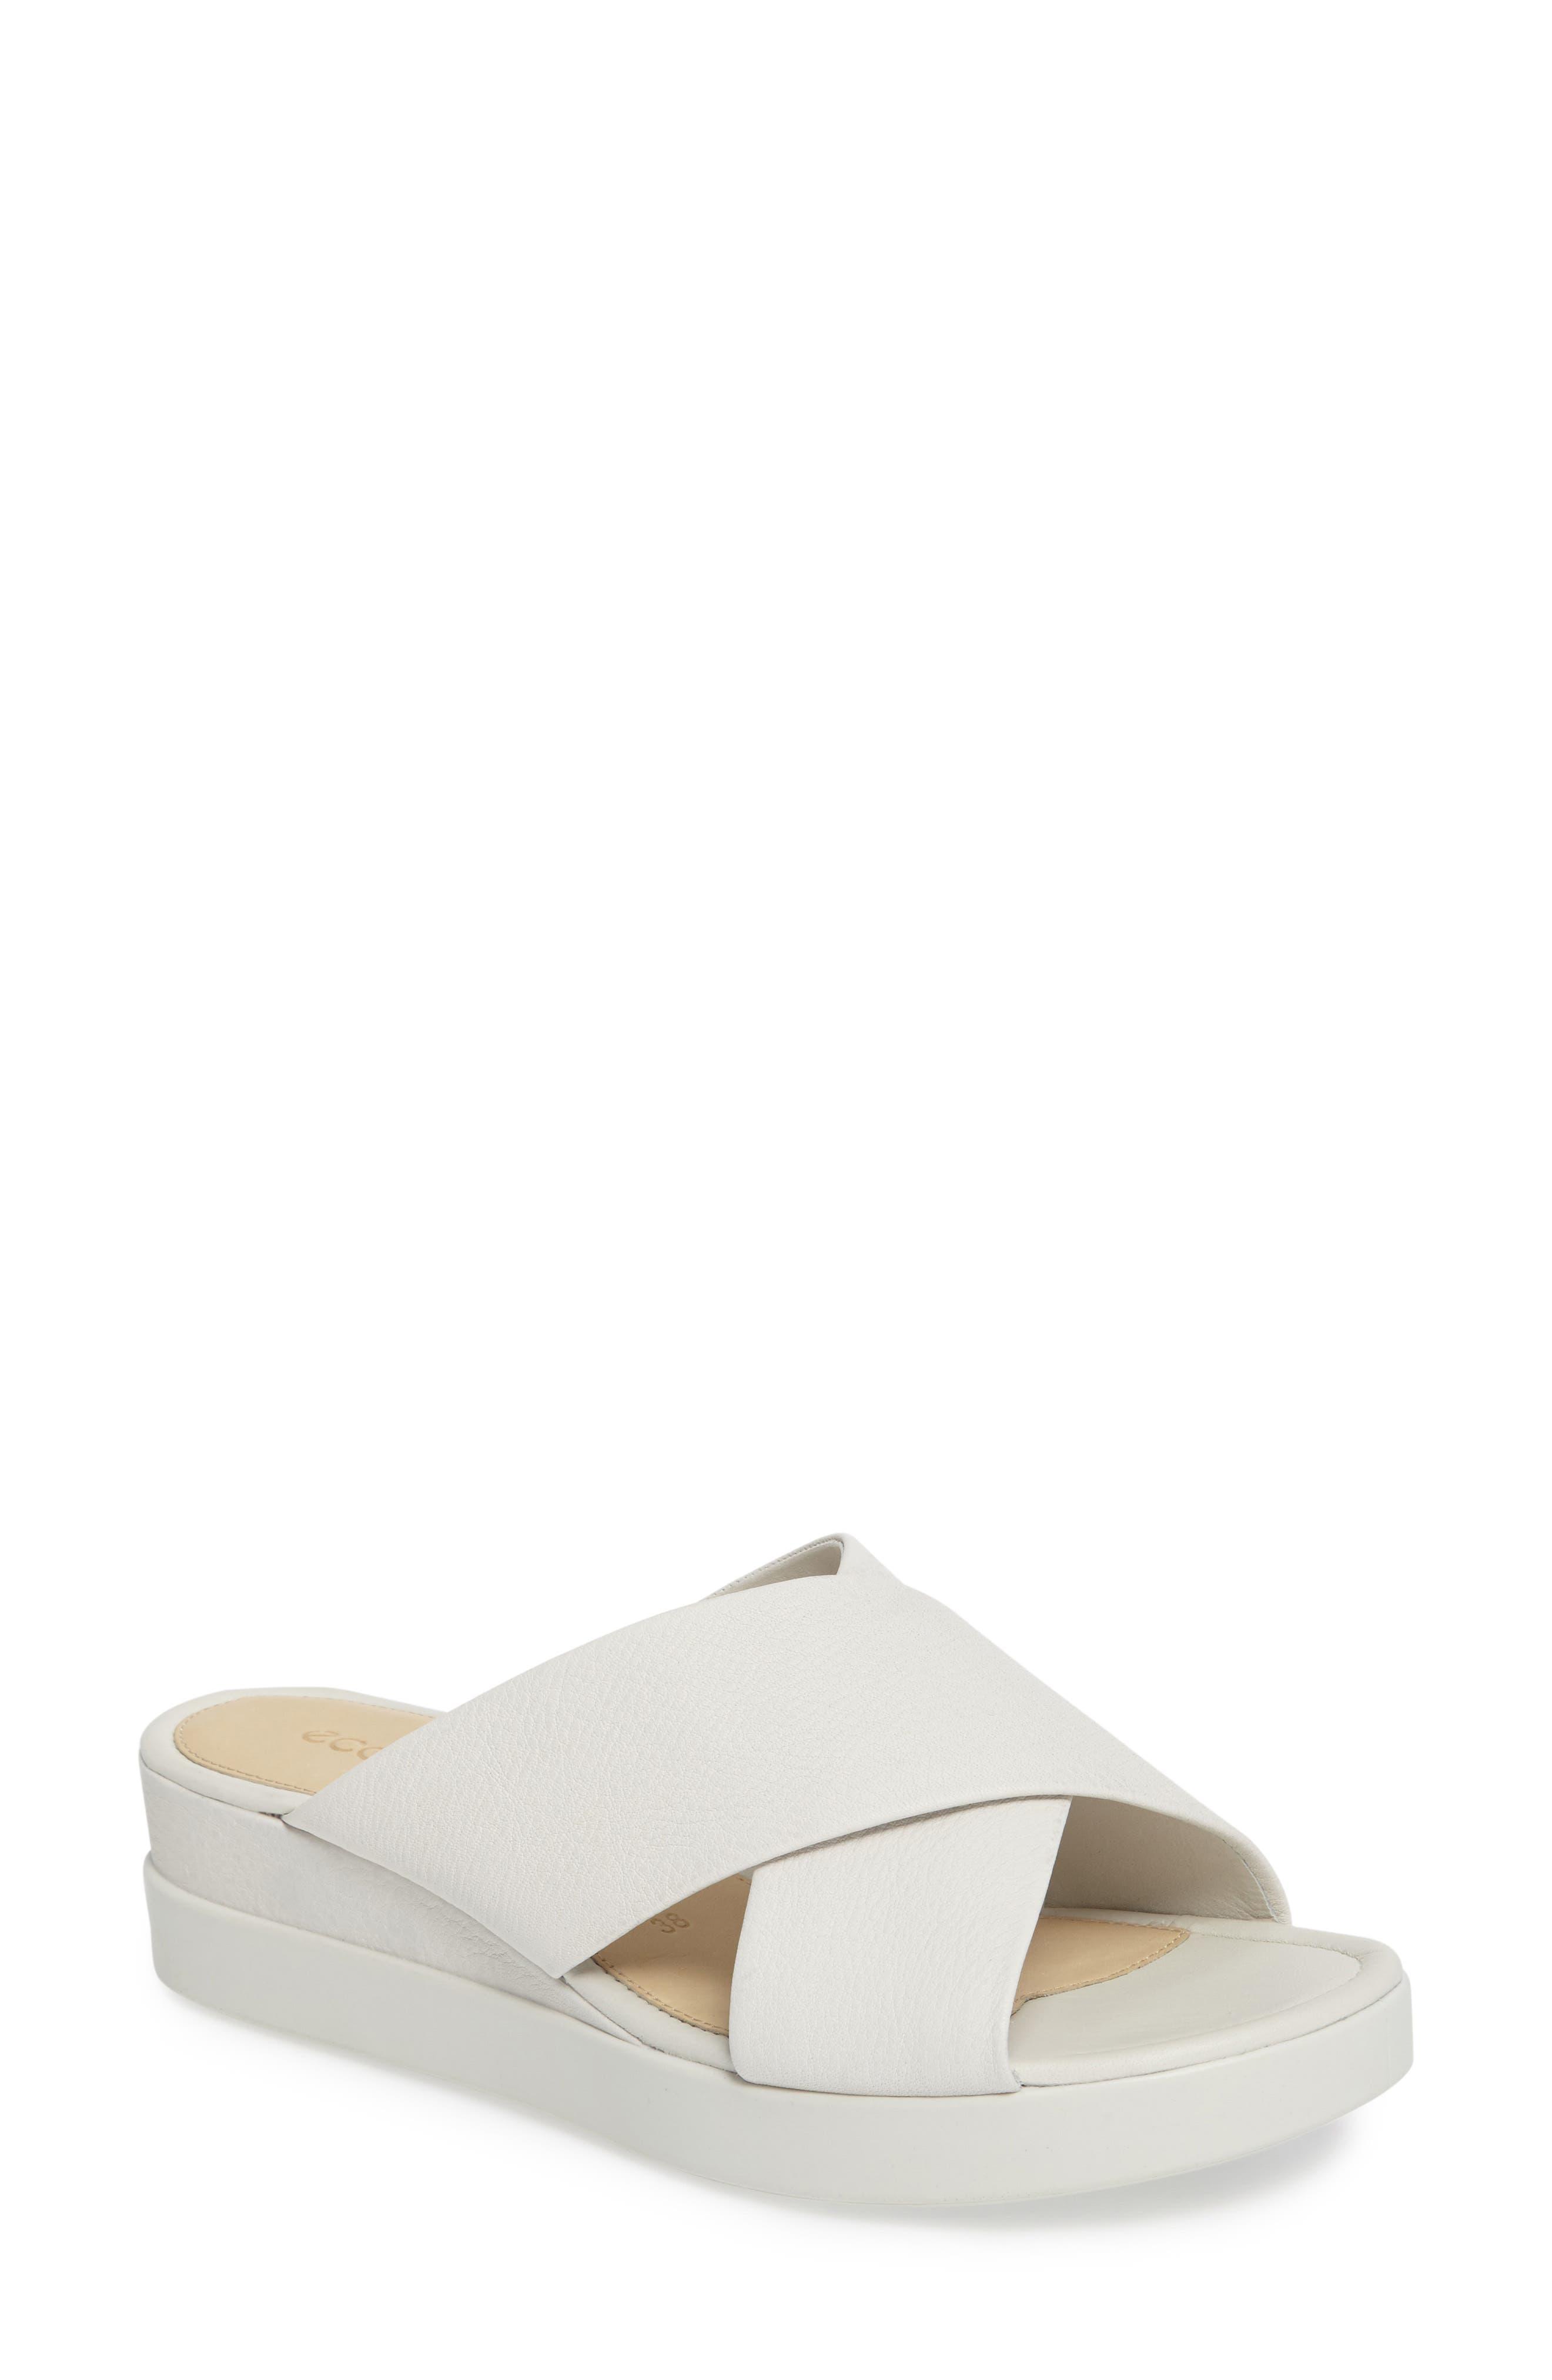 Main Image - ECCO Touch Slide Sandal (Women)